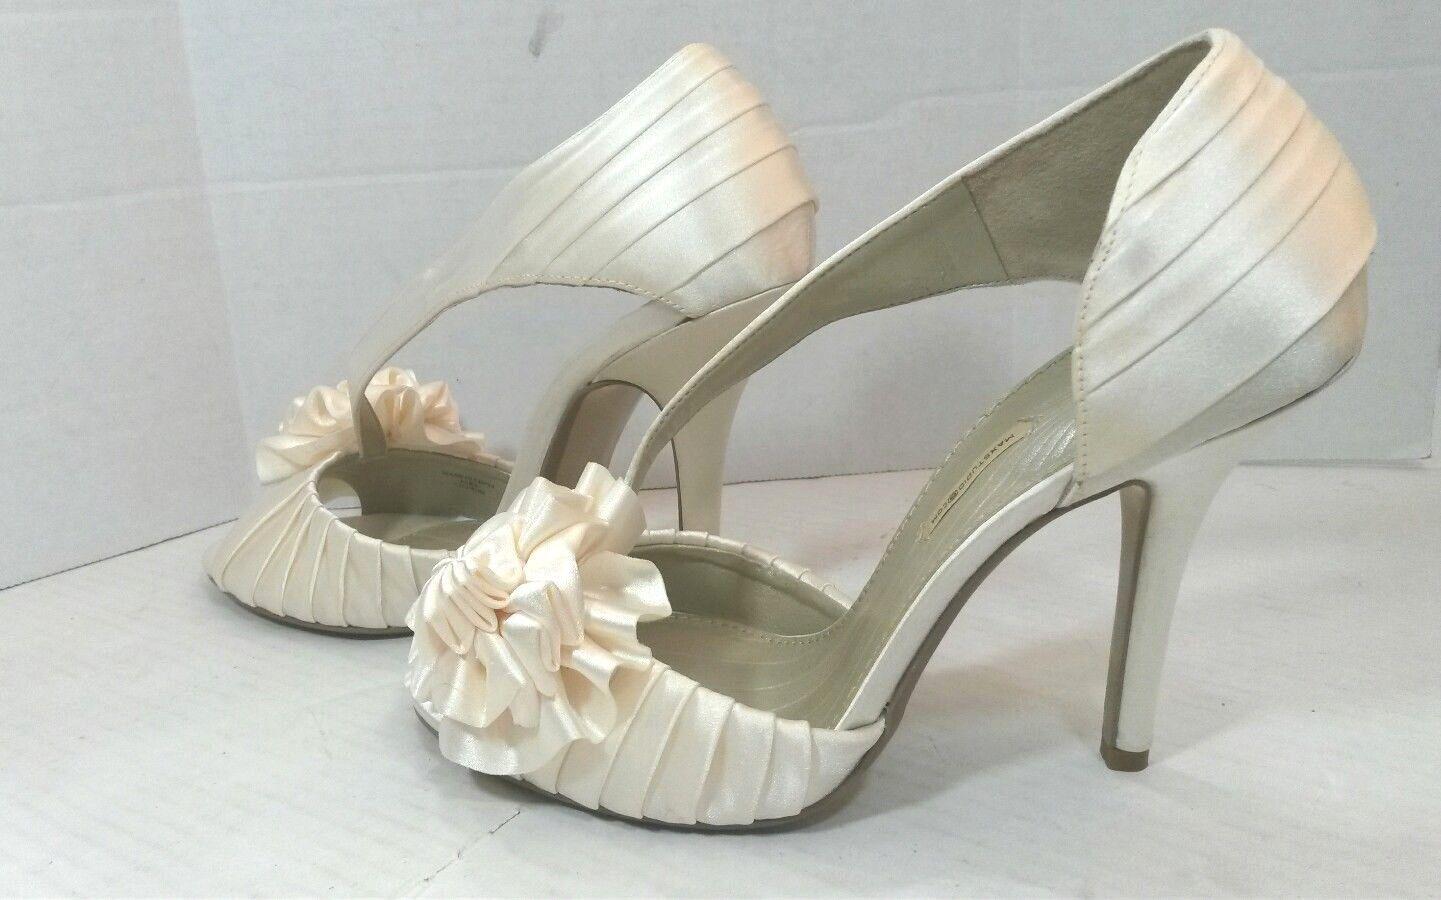 b471c74950 ... Max Studio Elba Elba Elba Slip On Peep Toe Pumps Dress Shoes Womens 7M  Pearl Ivory ...